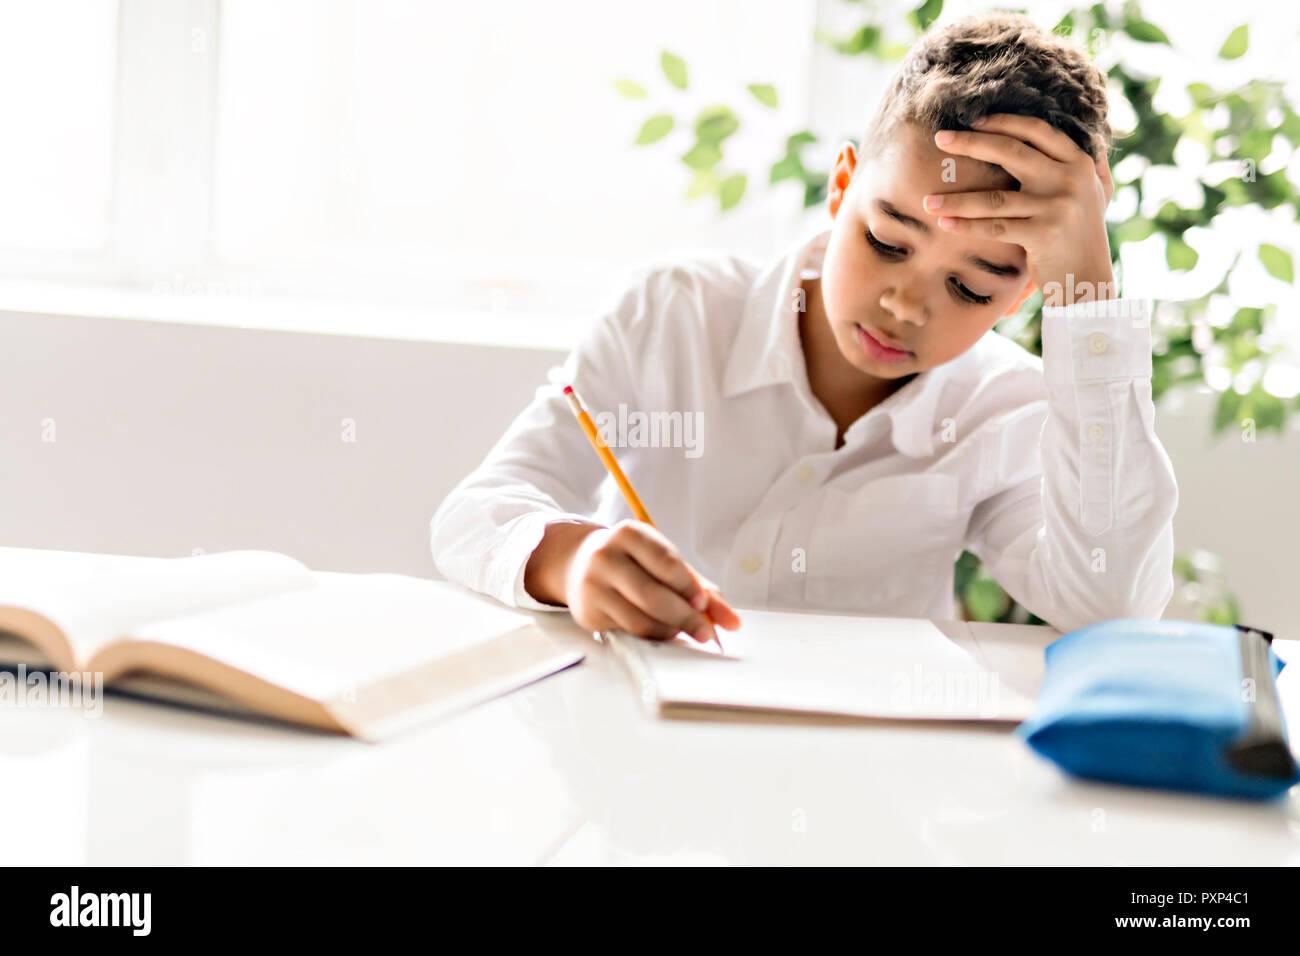 a cute black boy doing homework at home stock photo 222991889 alamy rh alamy com Doing Home Work Boy Doing His Homework